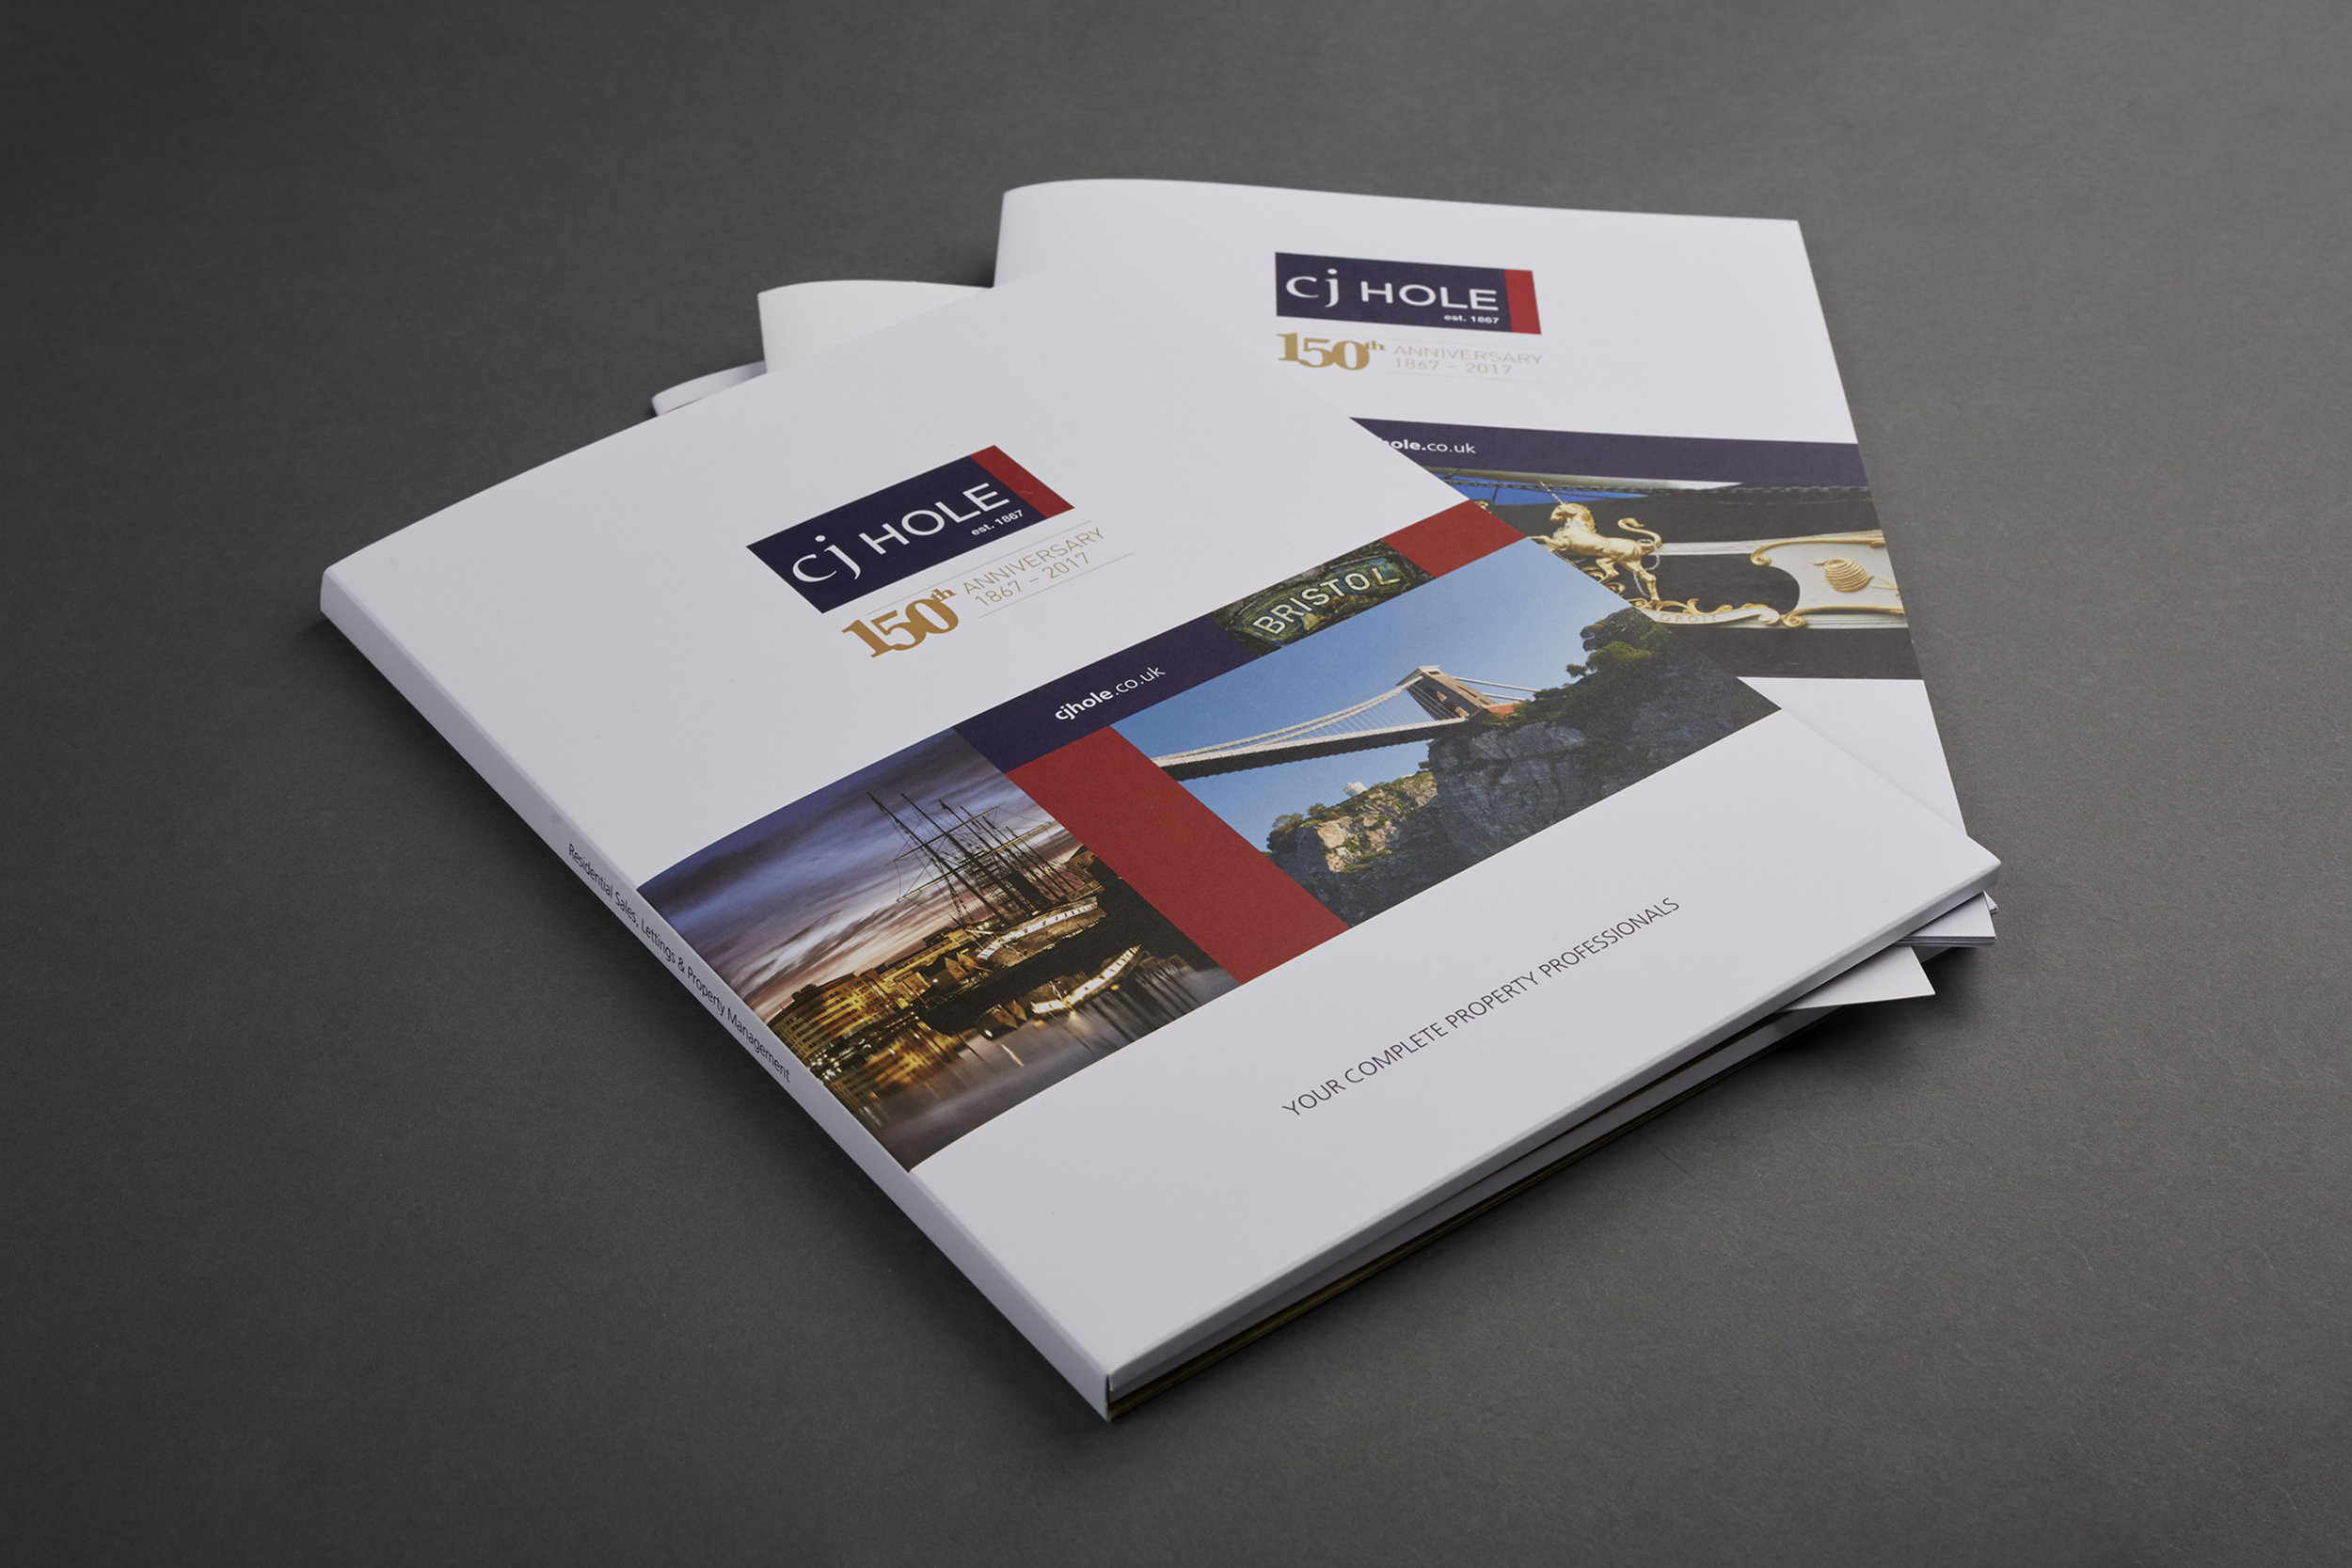 Splendid Design CJ Hole Brochure.jpg